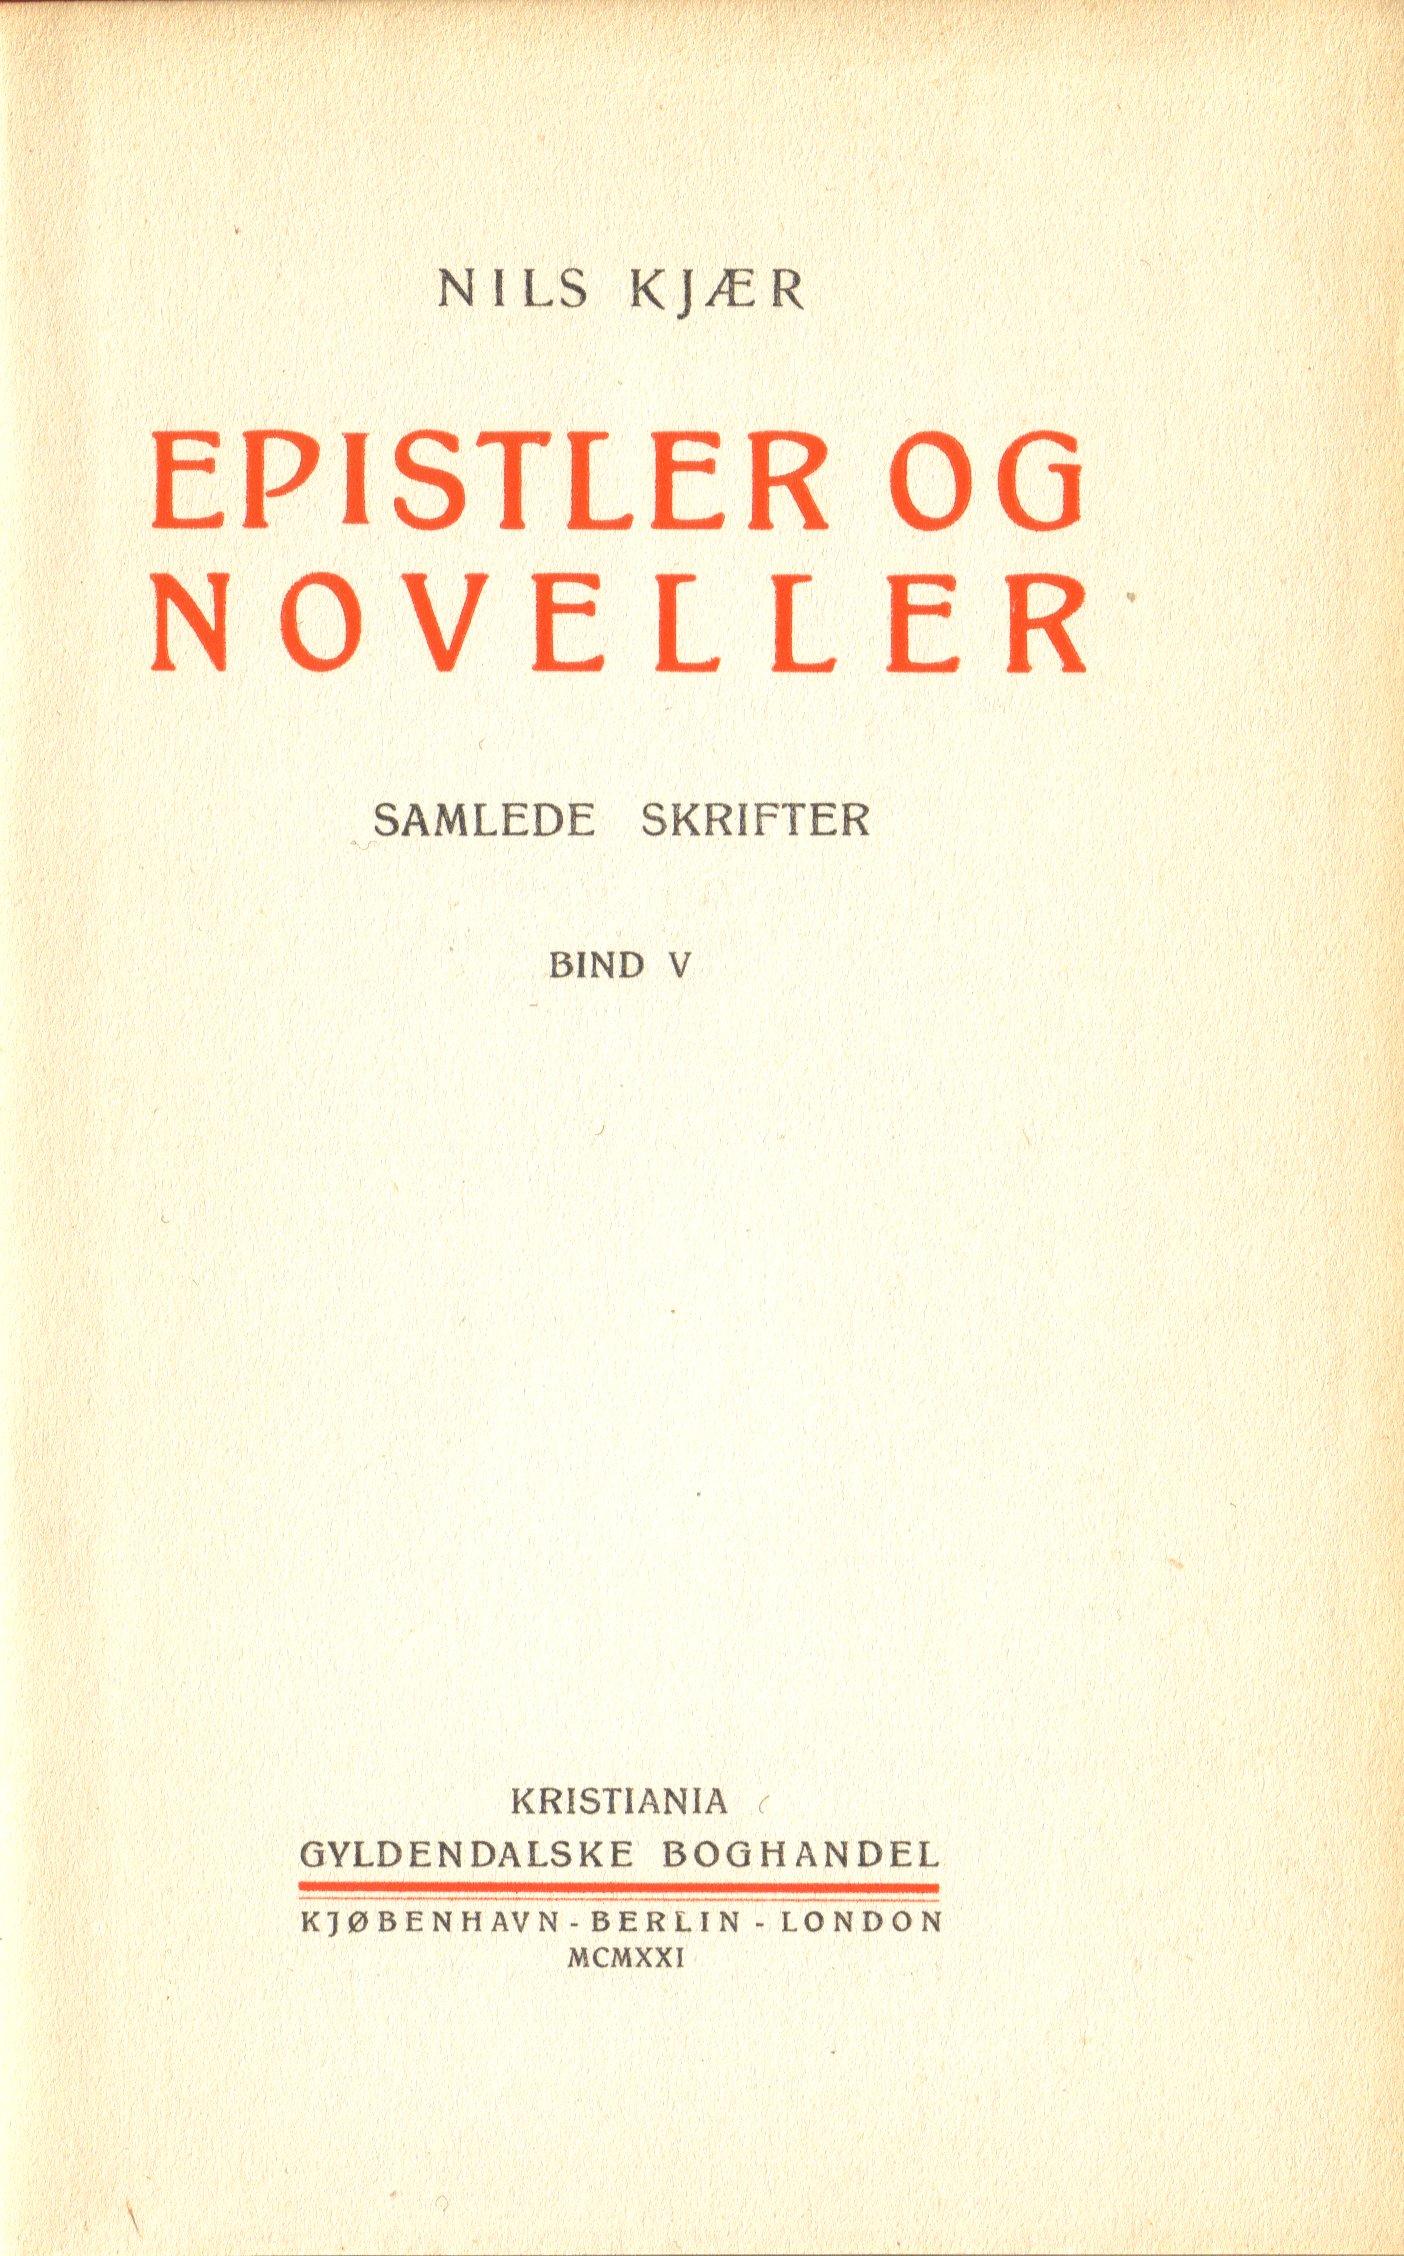 Samlade skrifter av August Strindberg.